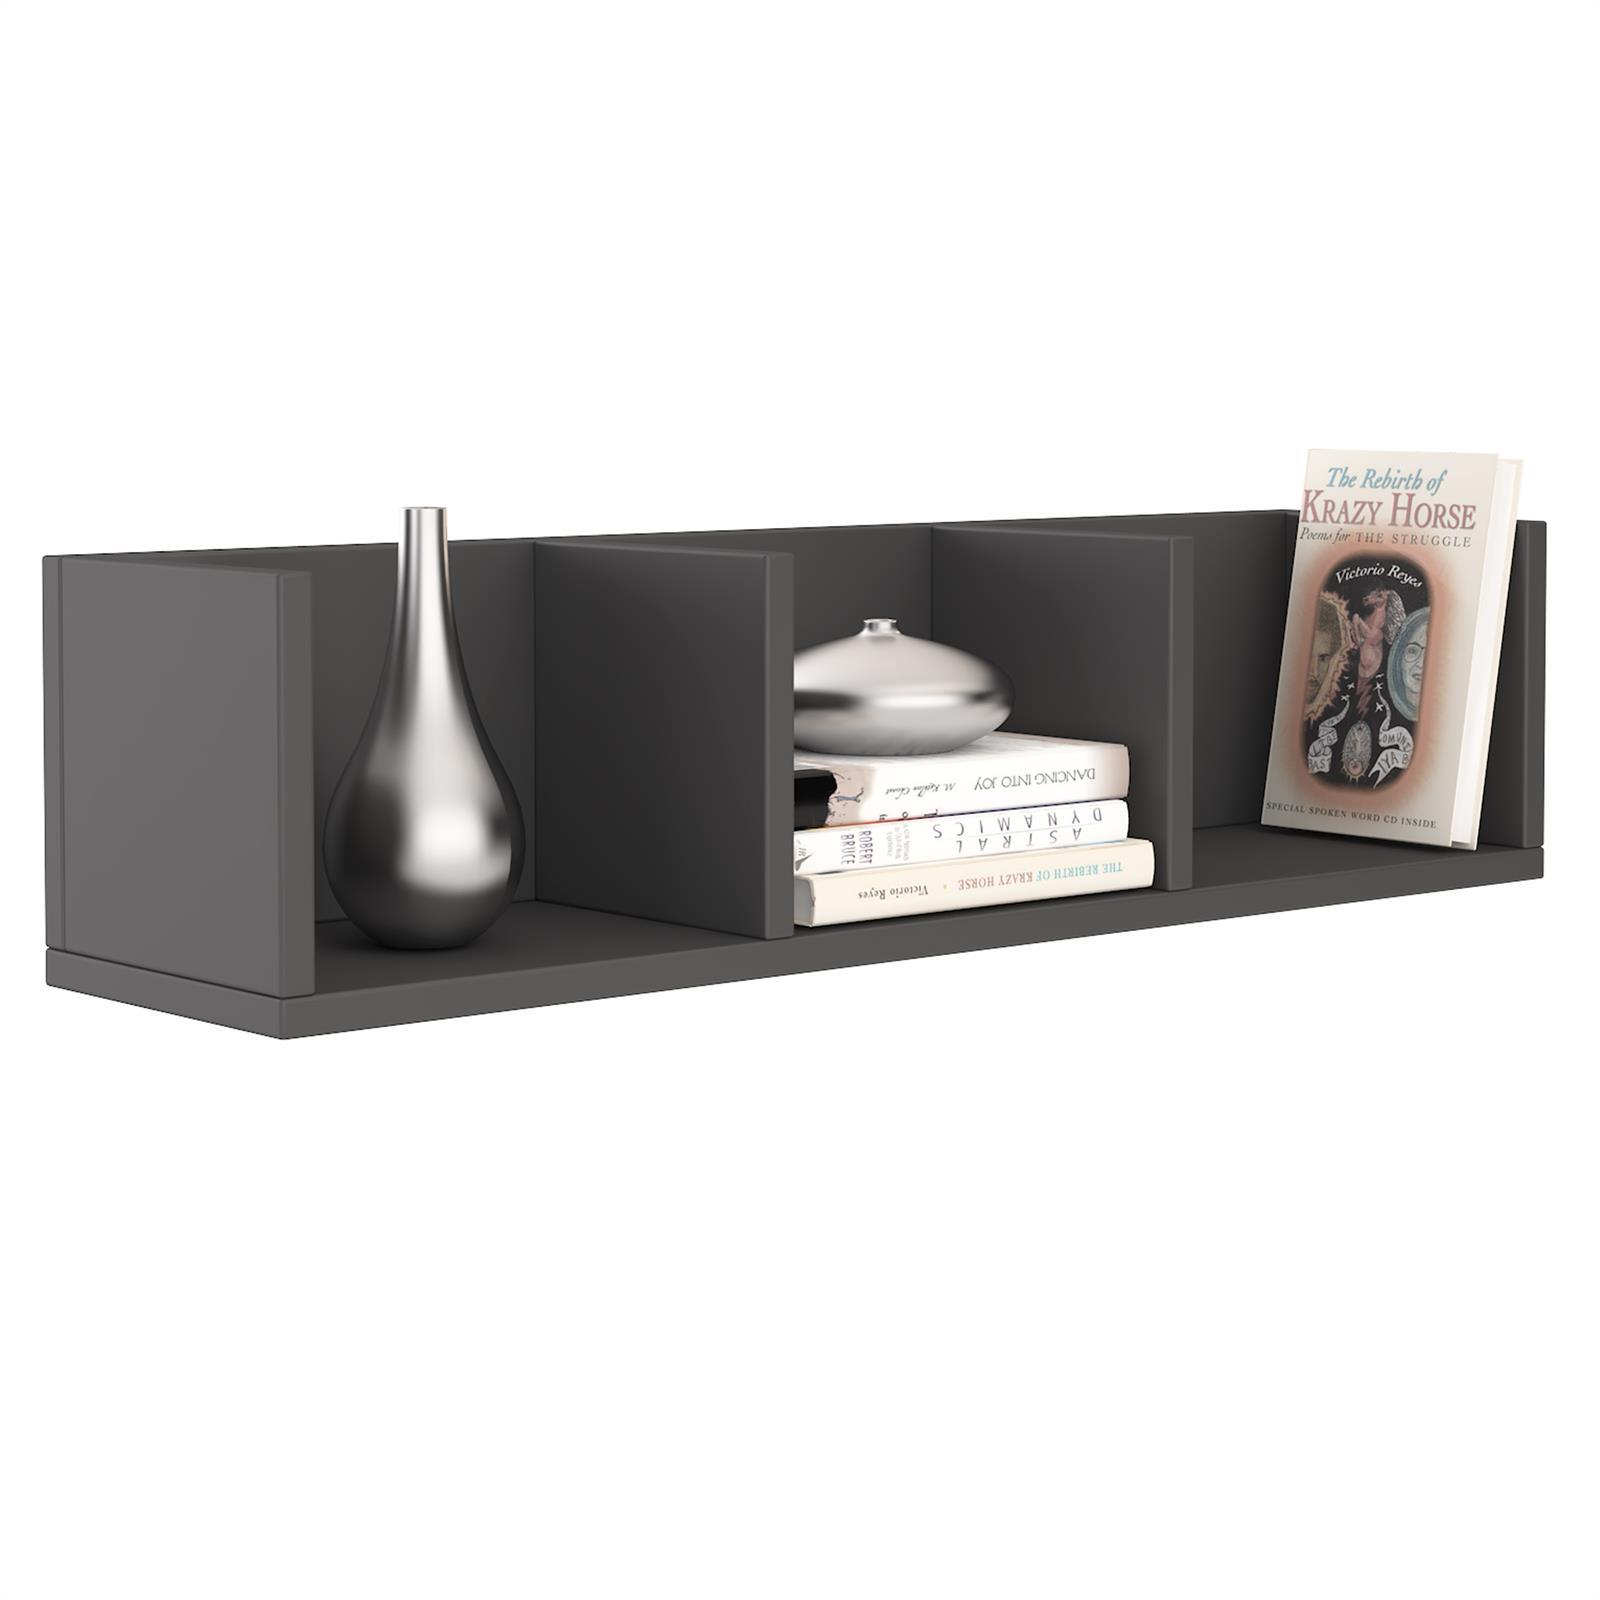 cd dvd regal wandregal h ngeregal deko b cher mit 3 ablagen 7 farben ebay. Black Bedroom Furniture Sets. Home Design Ideas